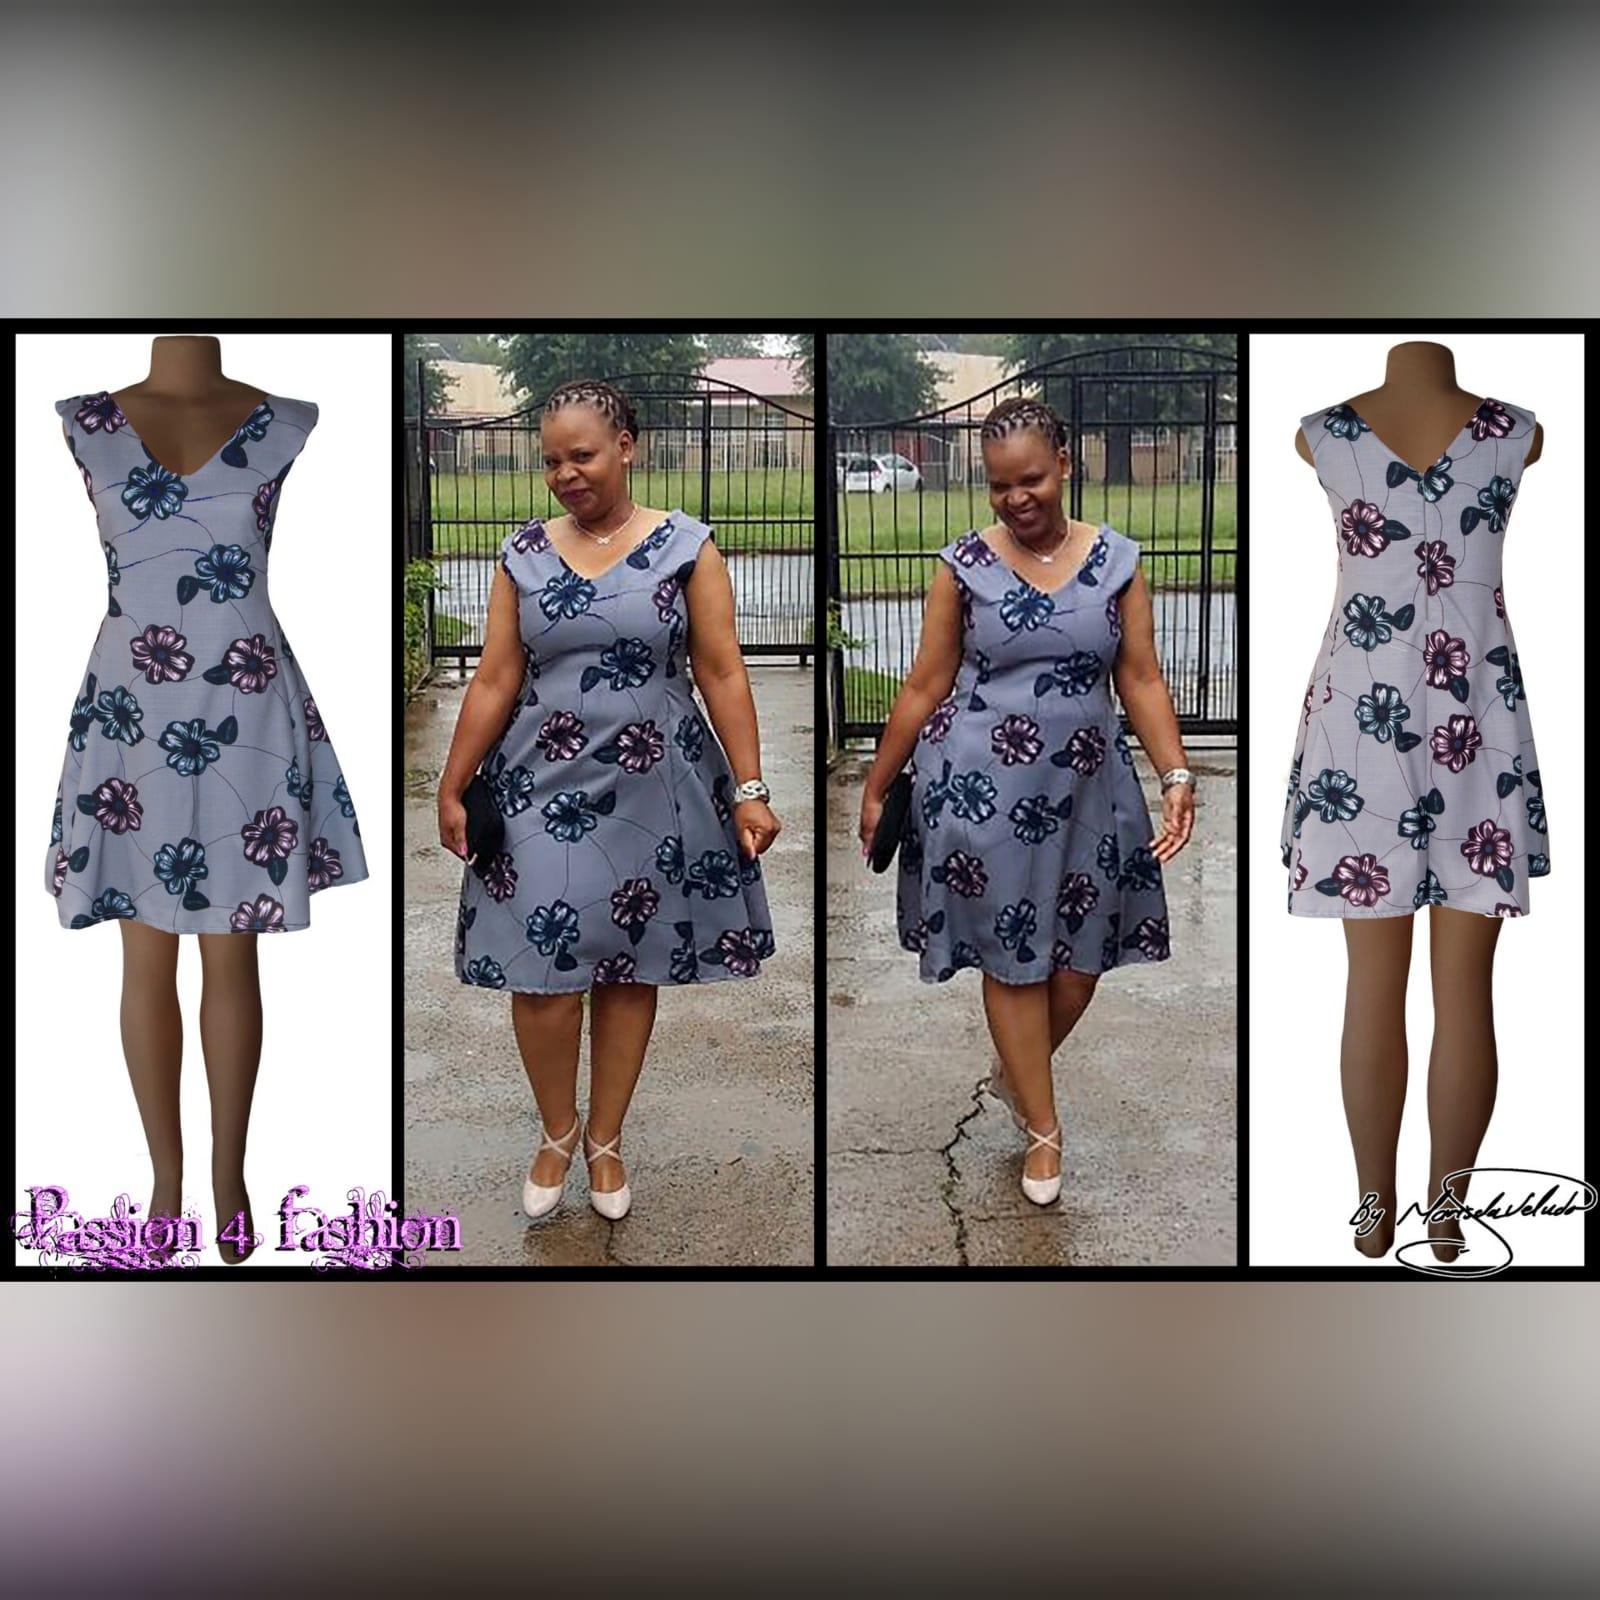 Grey floral smart casual knee length dress 5 grey floral smart casual knee length dress with a v neckline